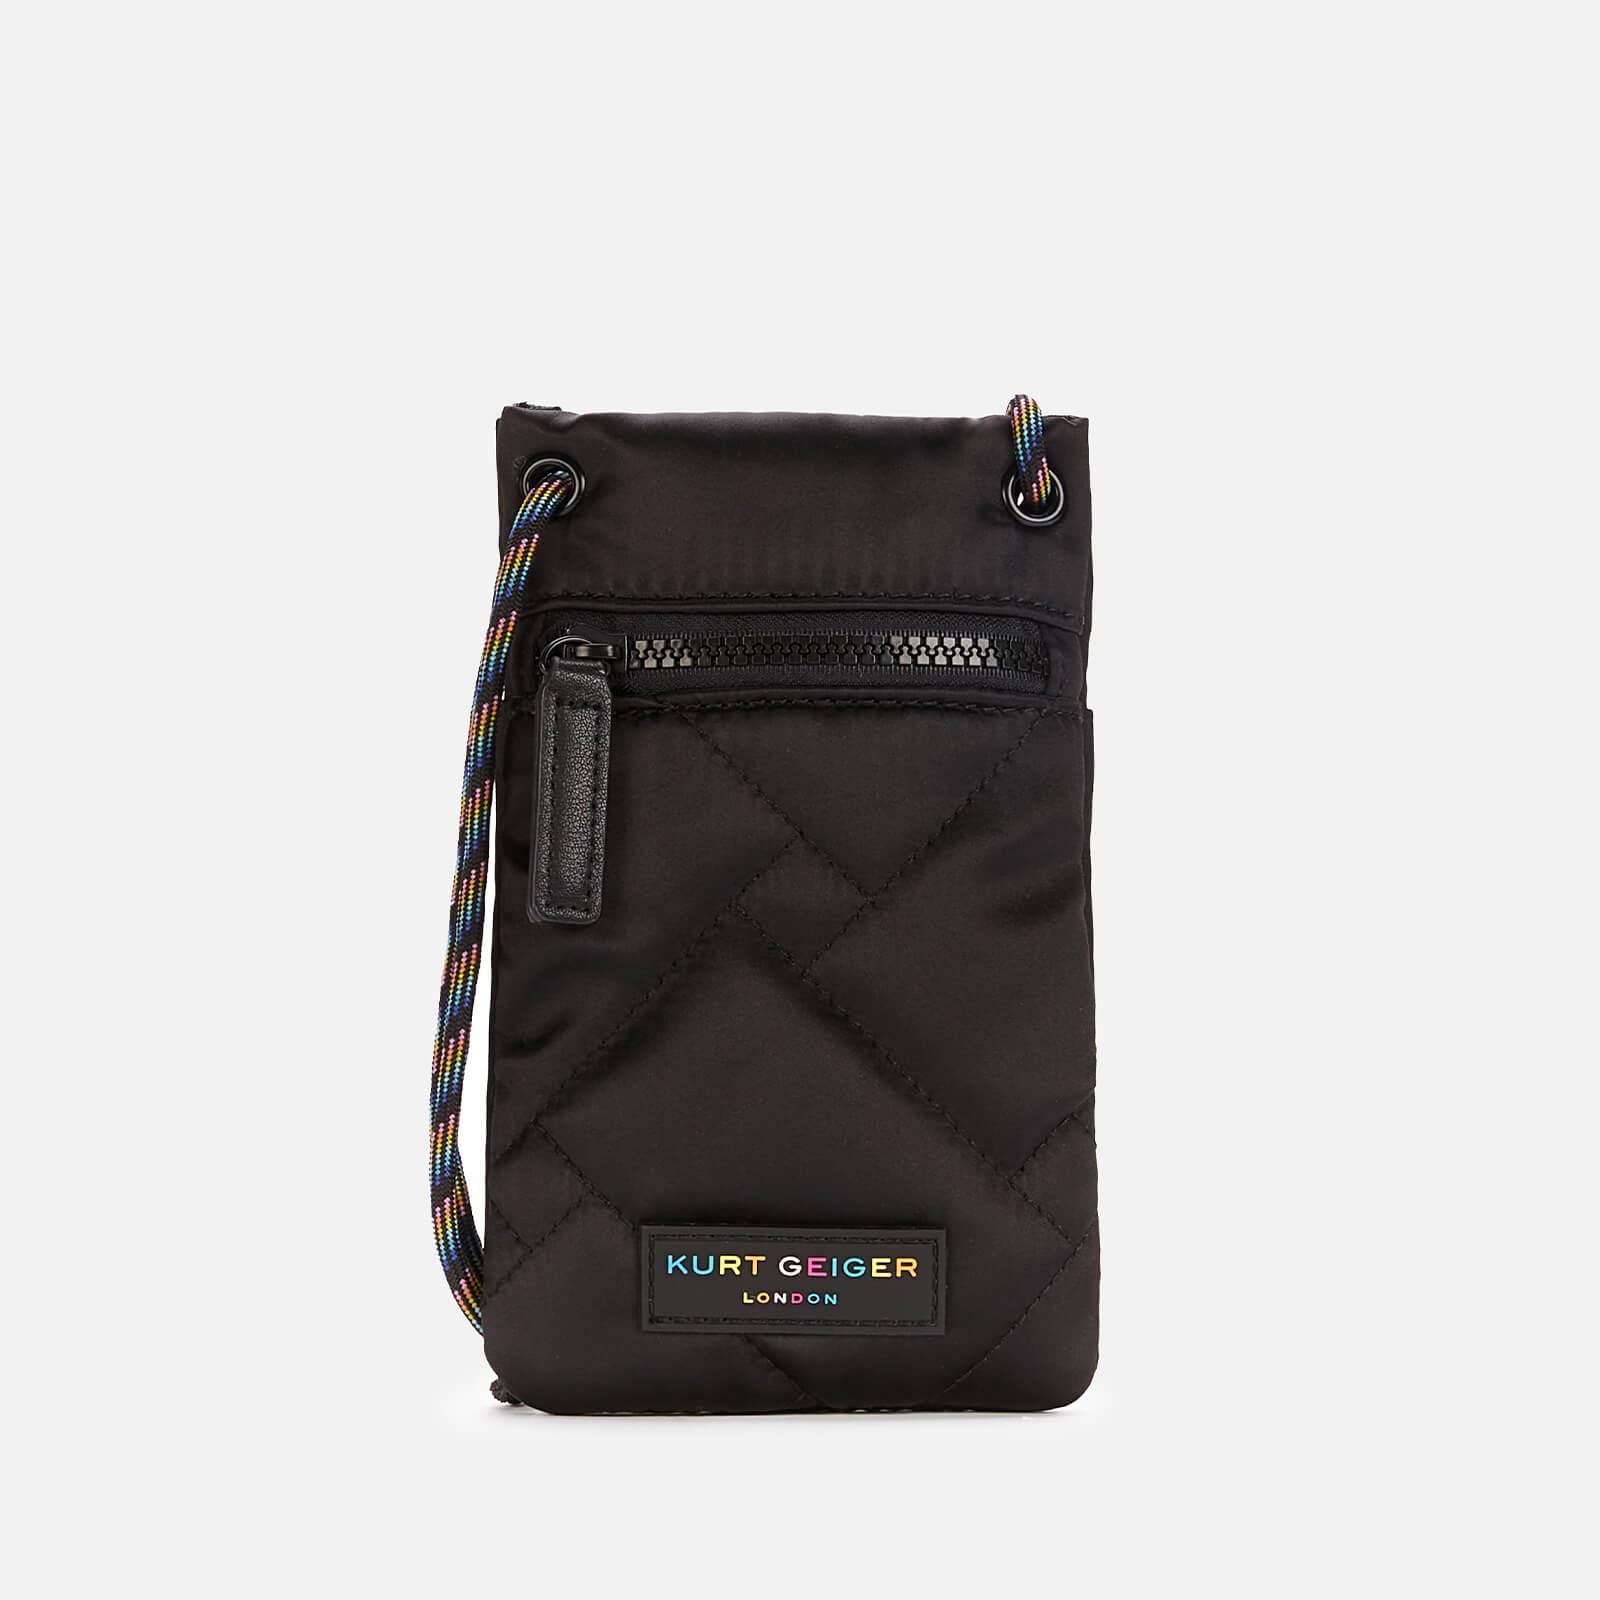 Kurt Geiger London Women's Recycled Phone Holder Cross Body Bag - Black